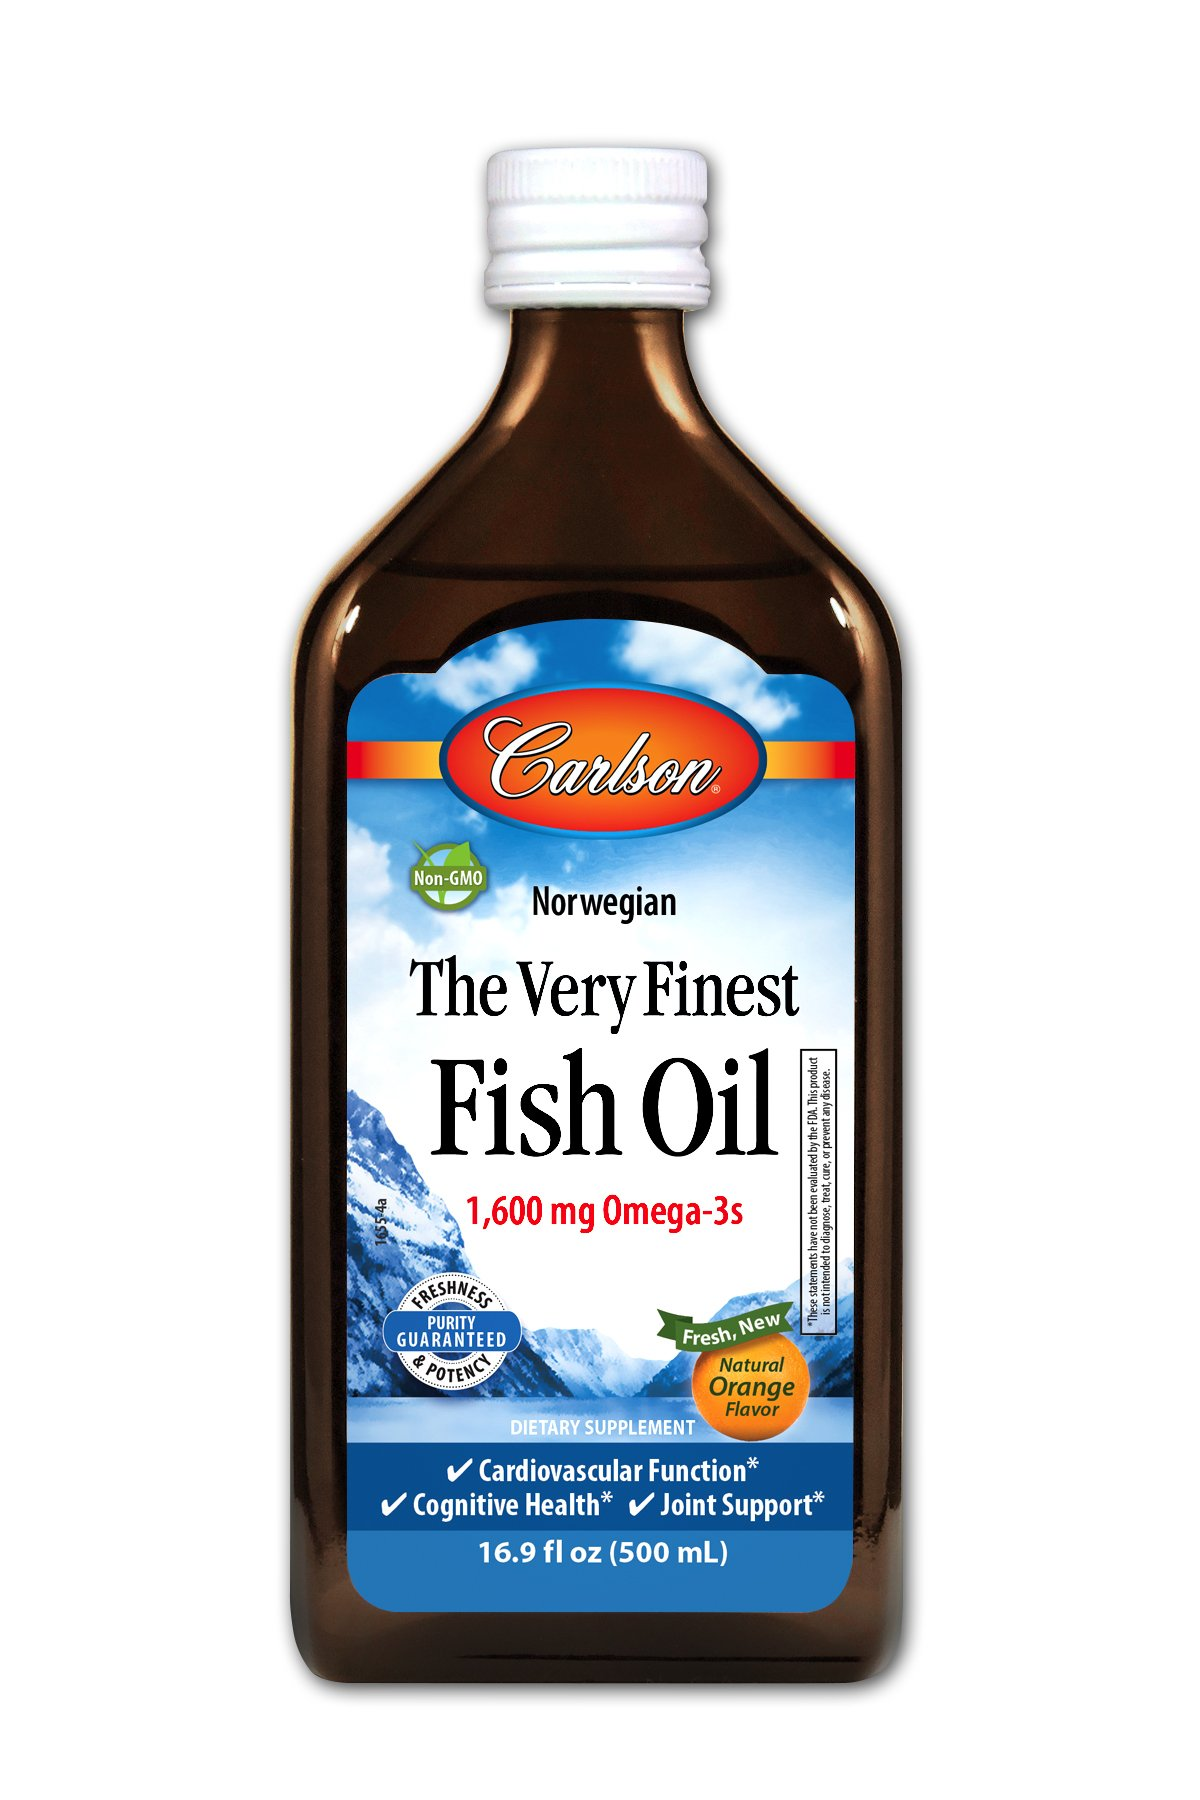 Carlson Norwegian The Very Finest Fish Oil, Orange, 1,600 mg Omega-3s, 500 mL